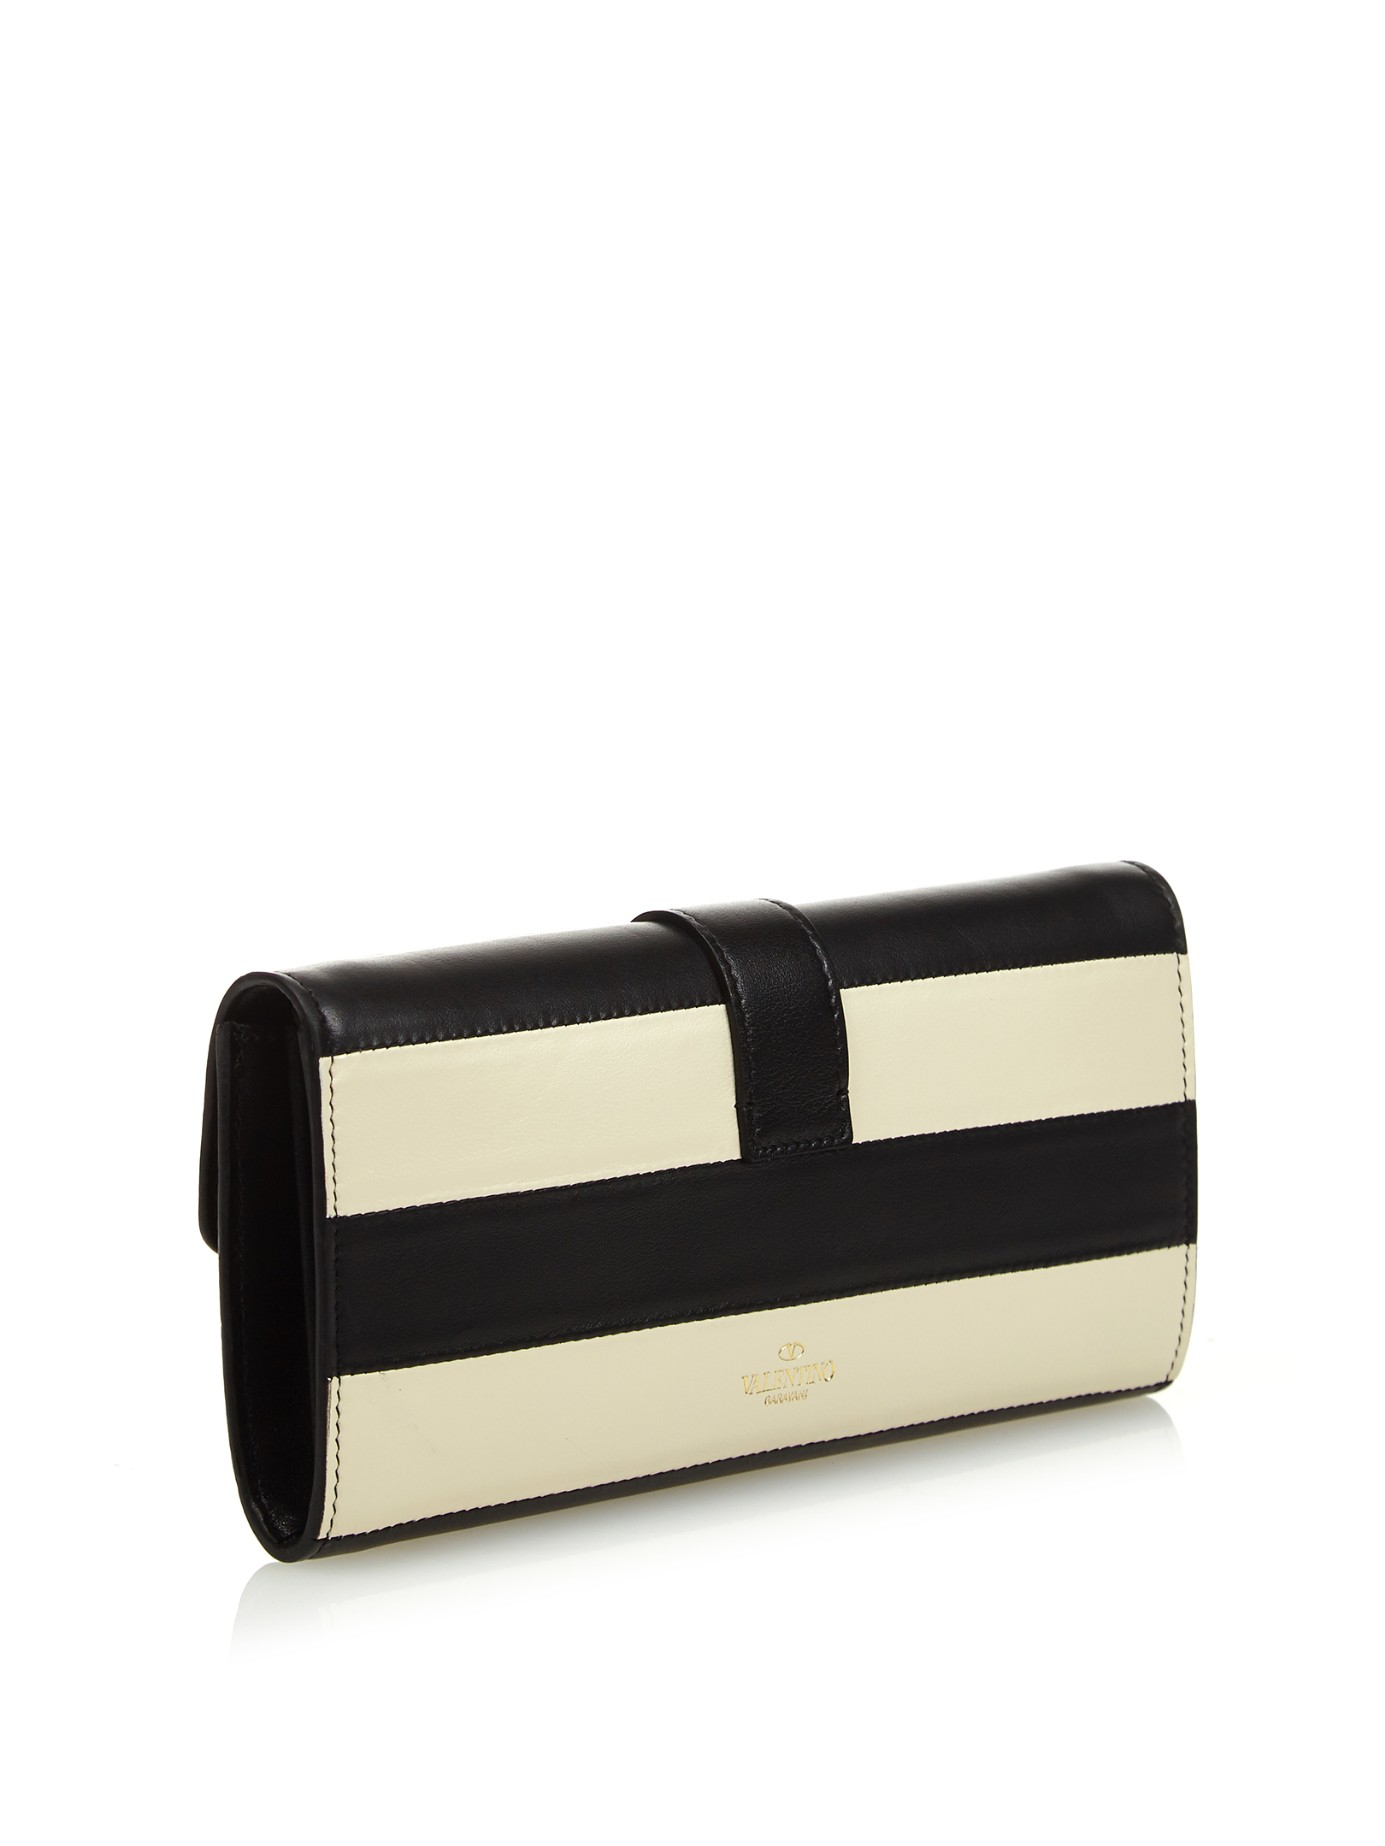 Valentino Striped Rockstud wallet wDzBapMW7